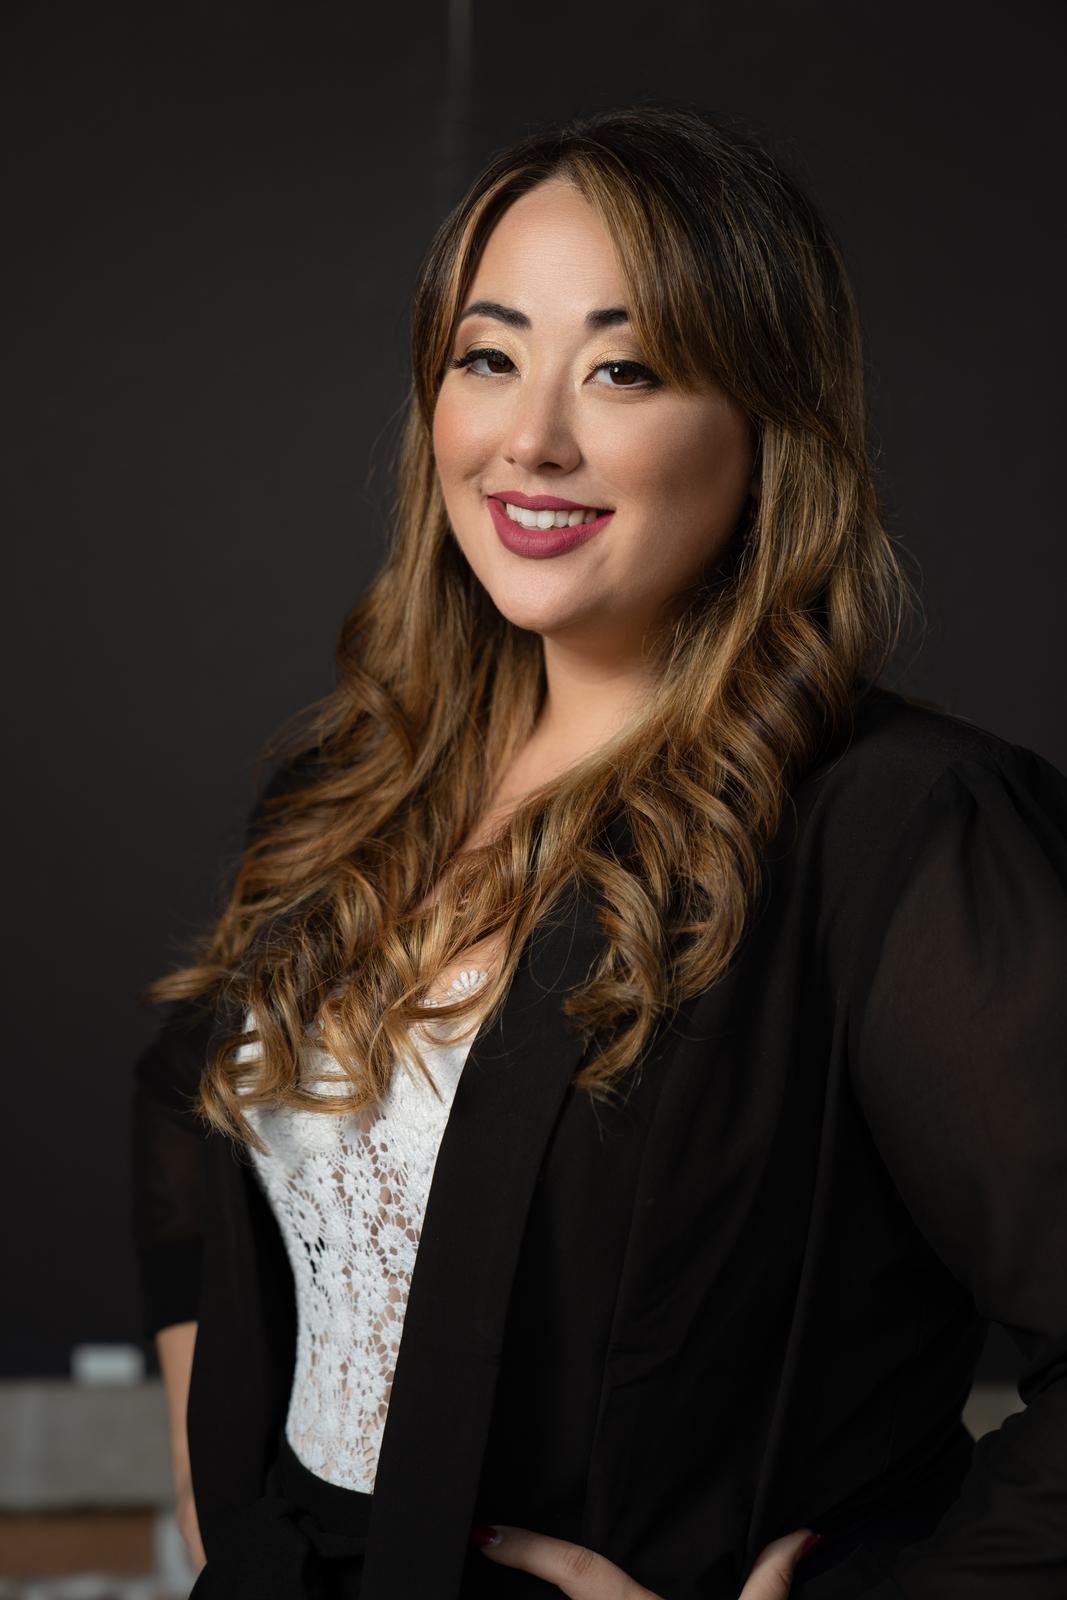 Millennial Master of Finance, Zoe Abbott shares her approach to Financial Planning